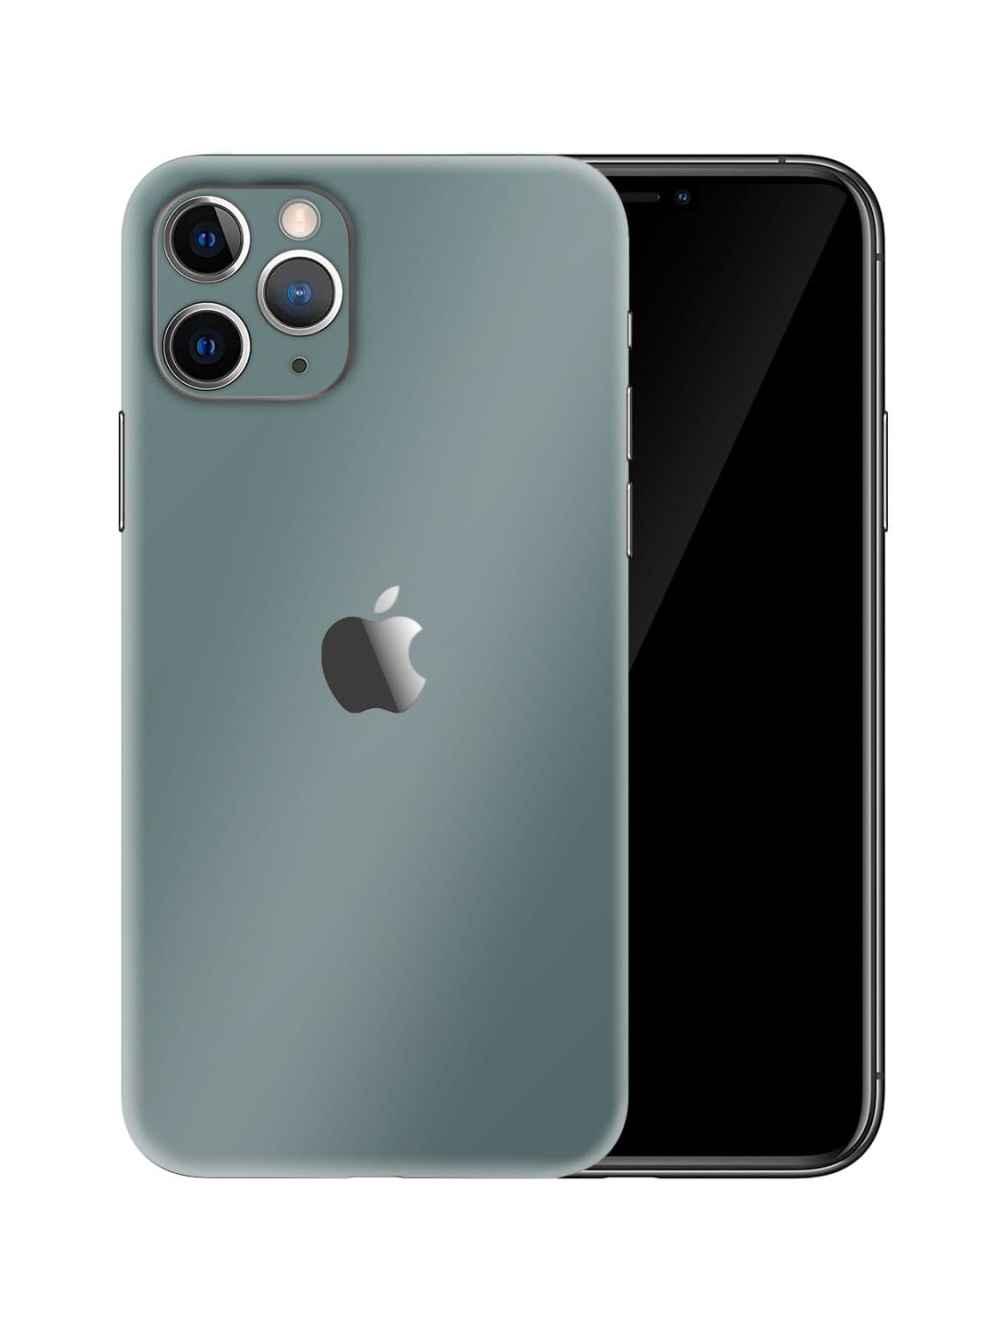 Apple iPhone 11 Pro Max GLOSSY Vinyl Skin Wrap